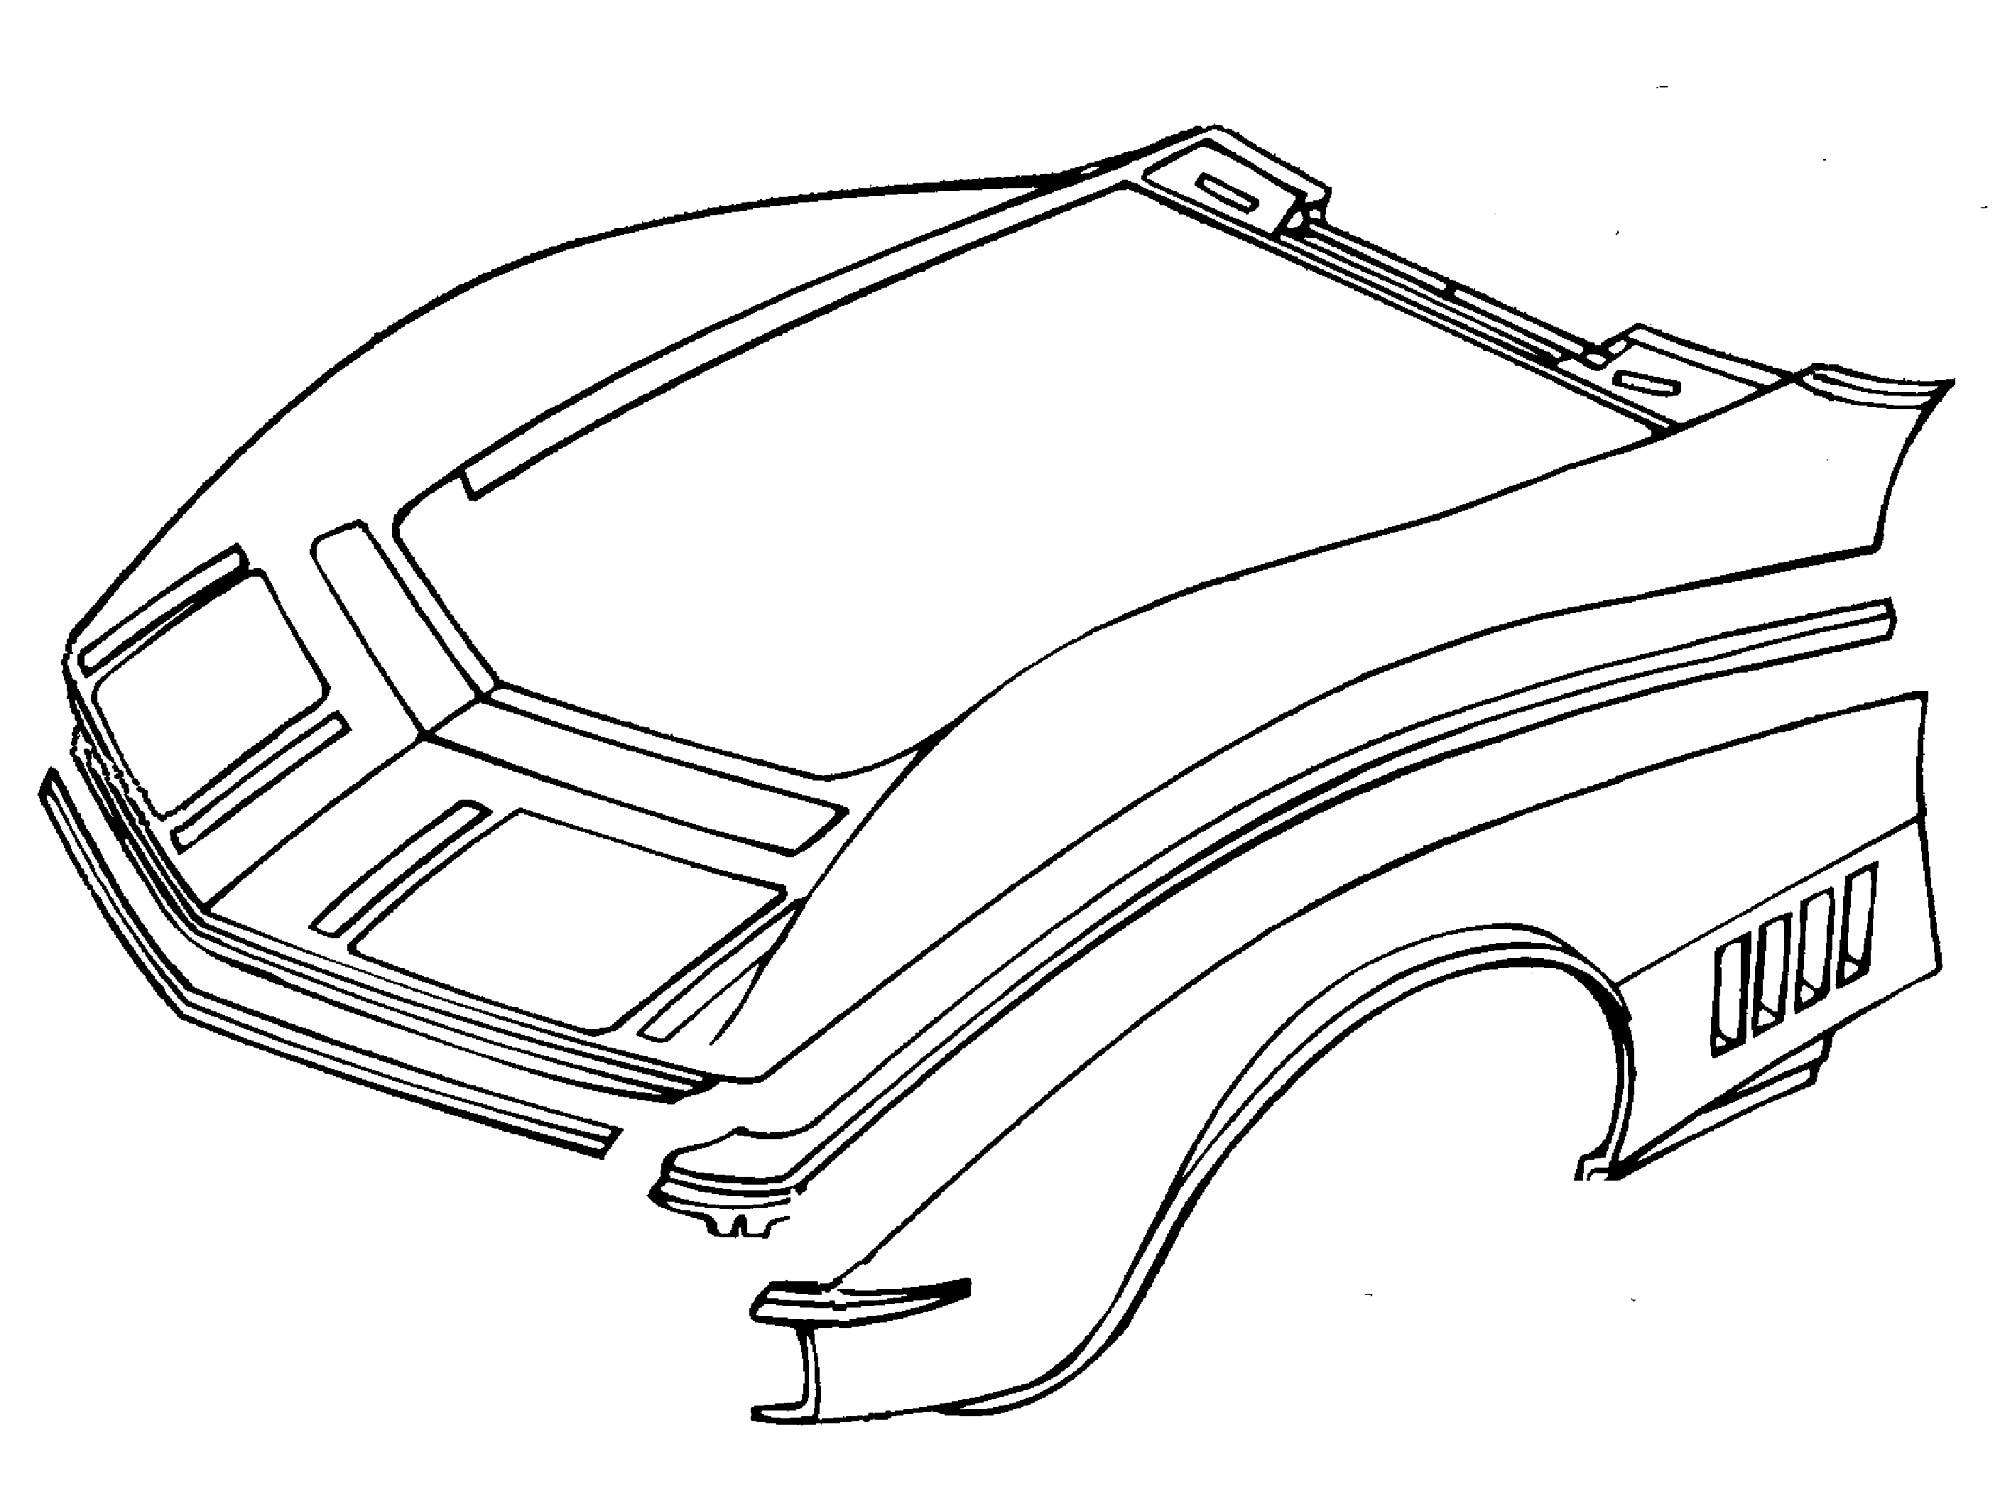 Repairing Your Corvettes Minor Fiberglass Damage